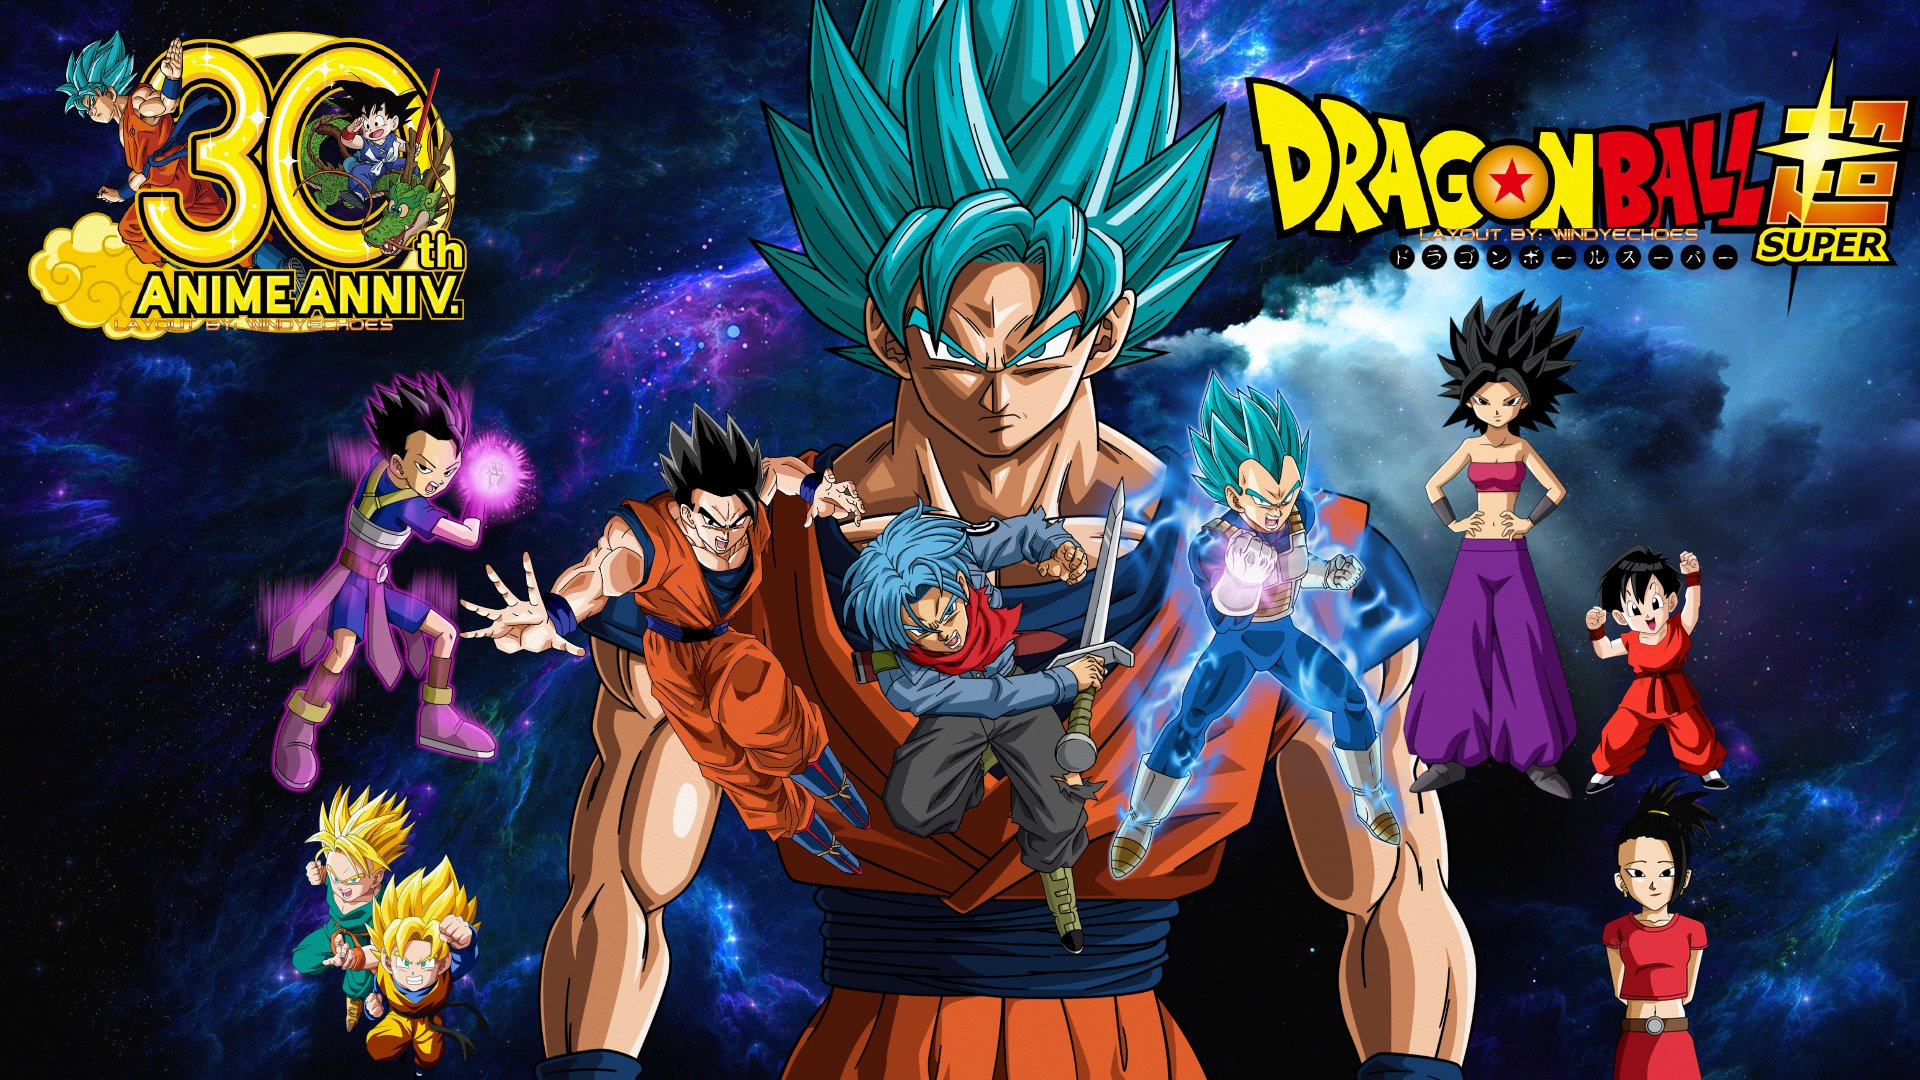 Dragon Ball Super All Saiyans Wallpaper By Windyechoes On Deviantart